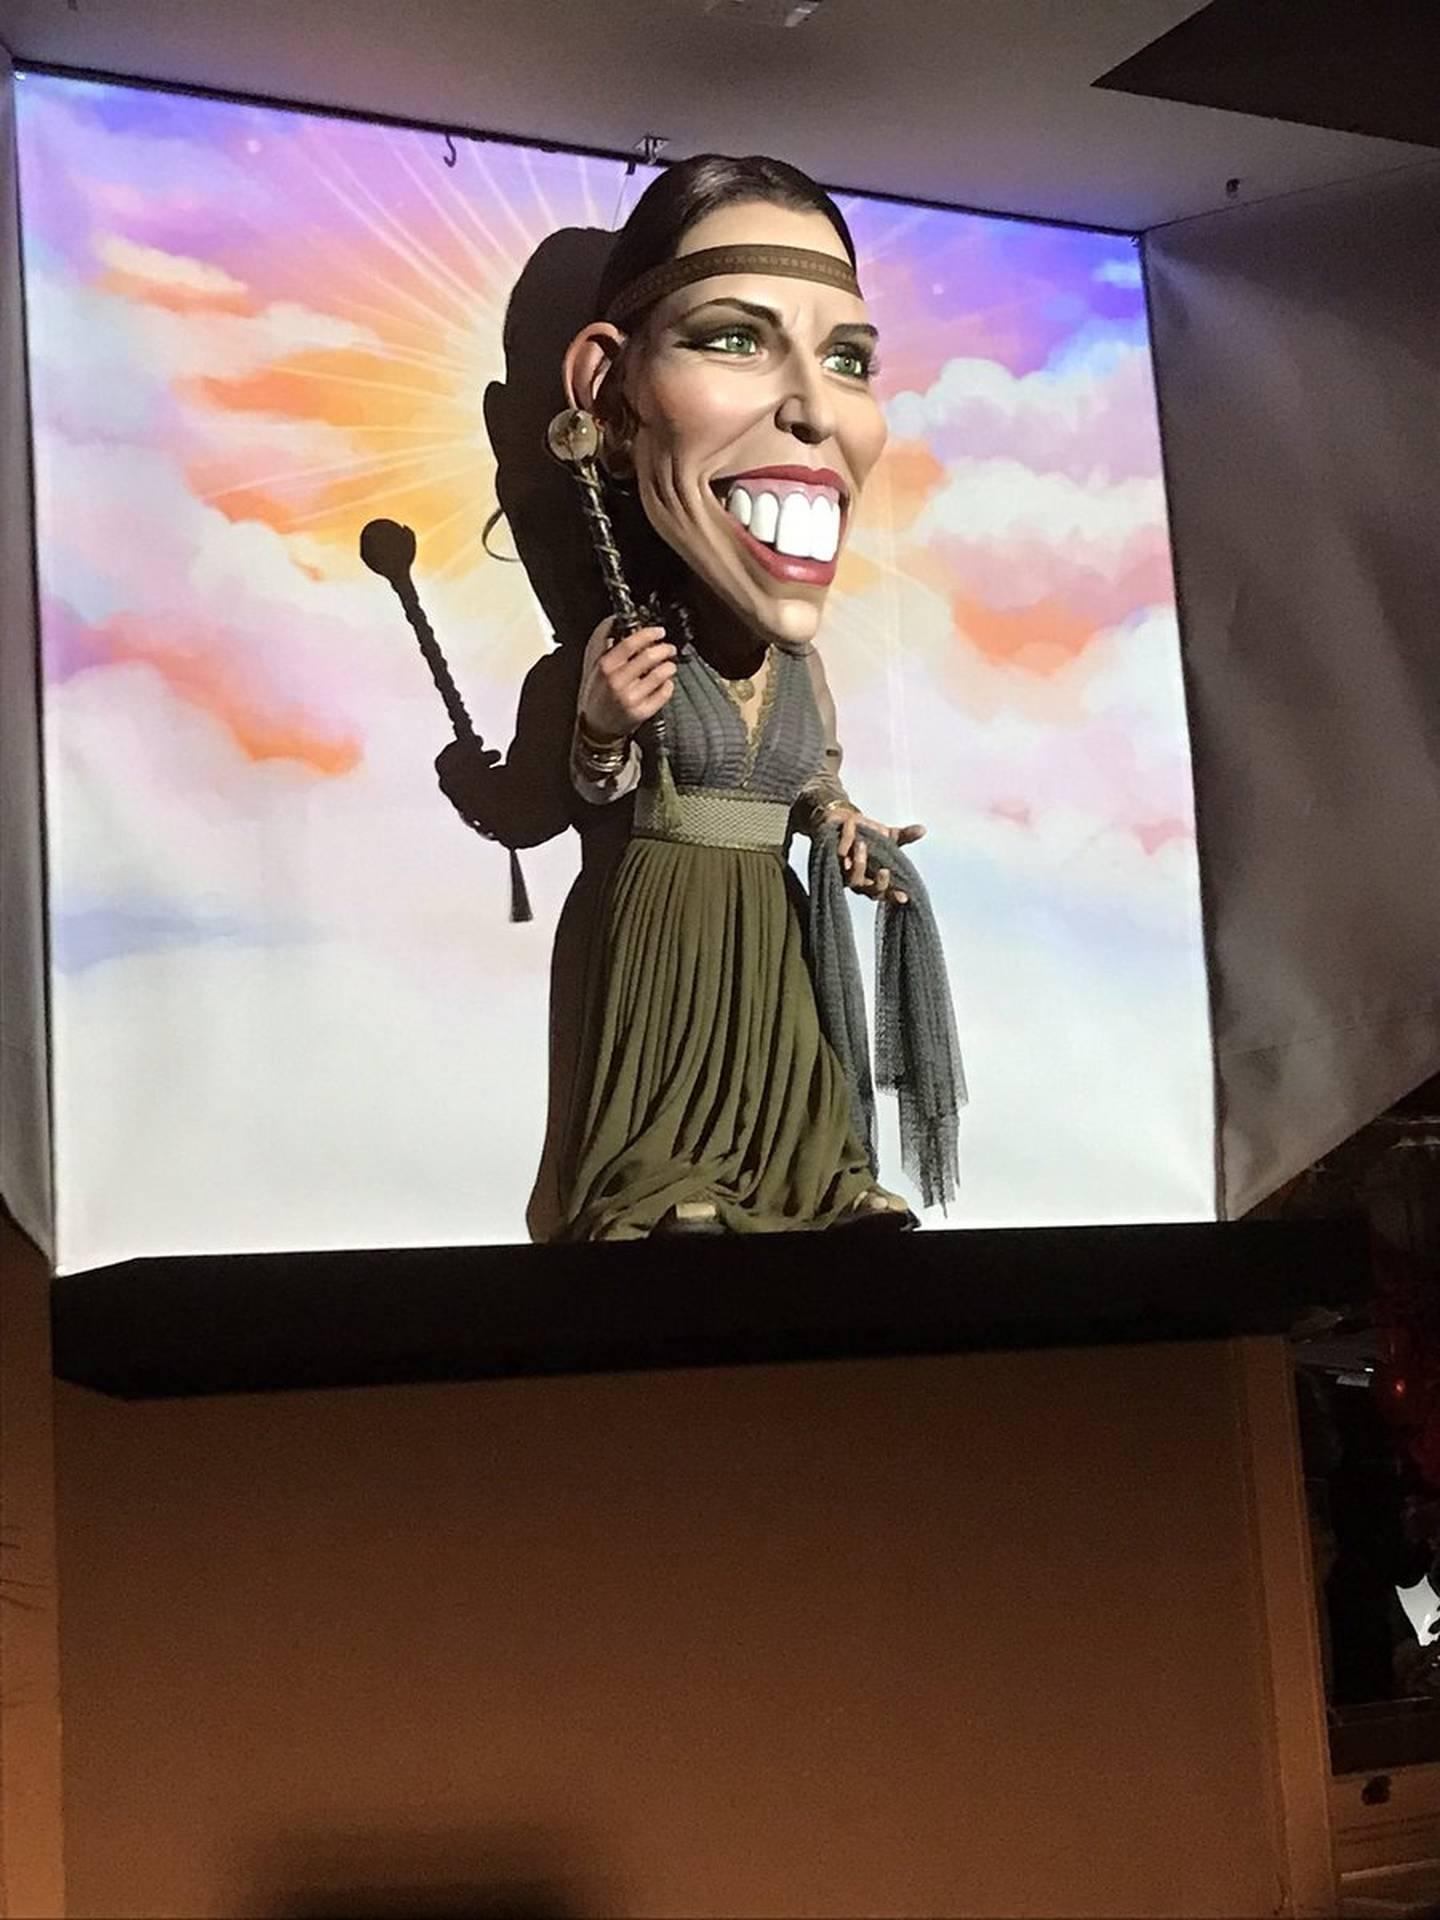 Prime Minister Jacinda Ardern's new puppet unveiled. Photo / Jason Walls